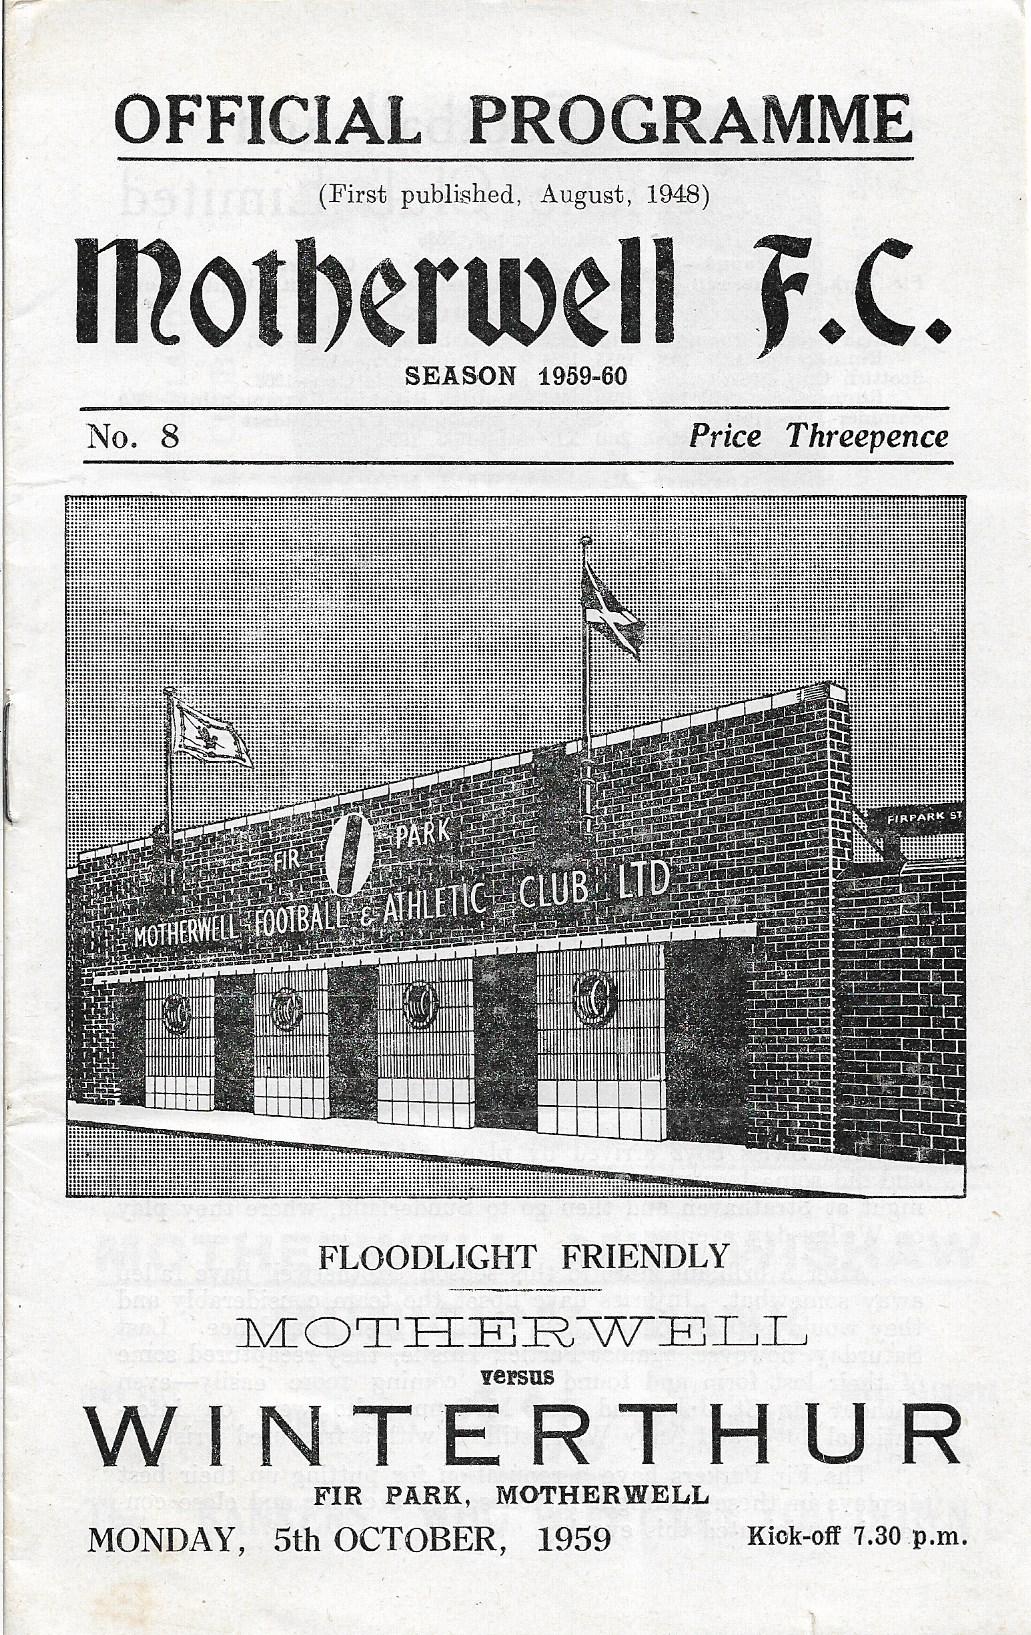 Motherwell versus Winterthur - Programme Cover